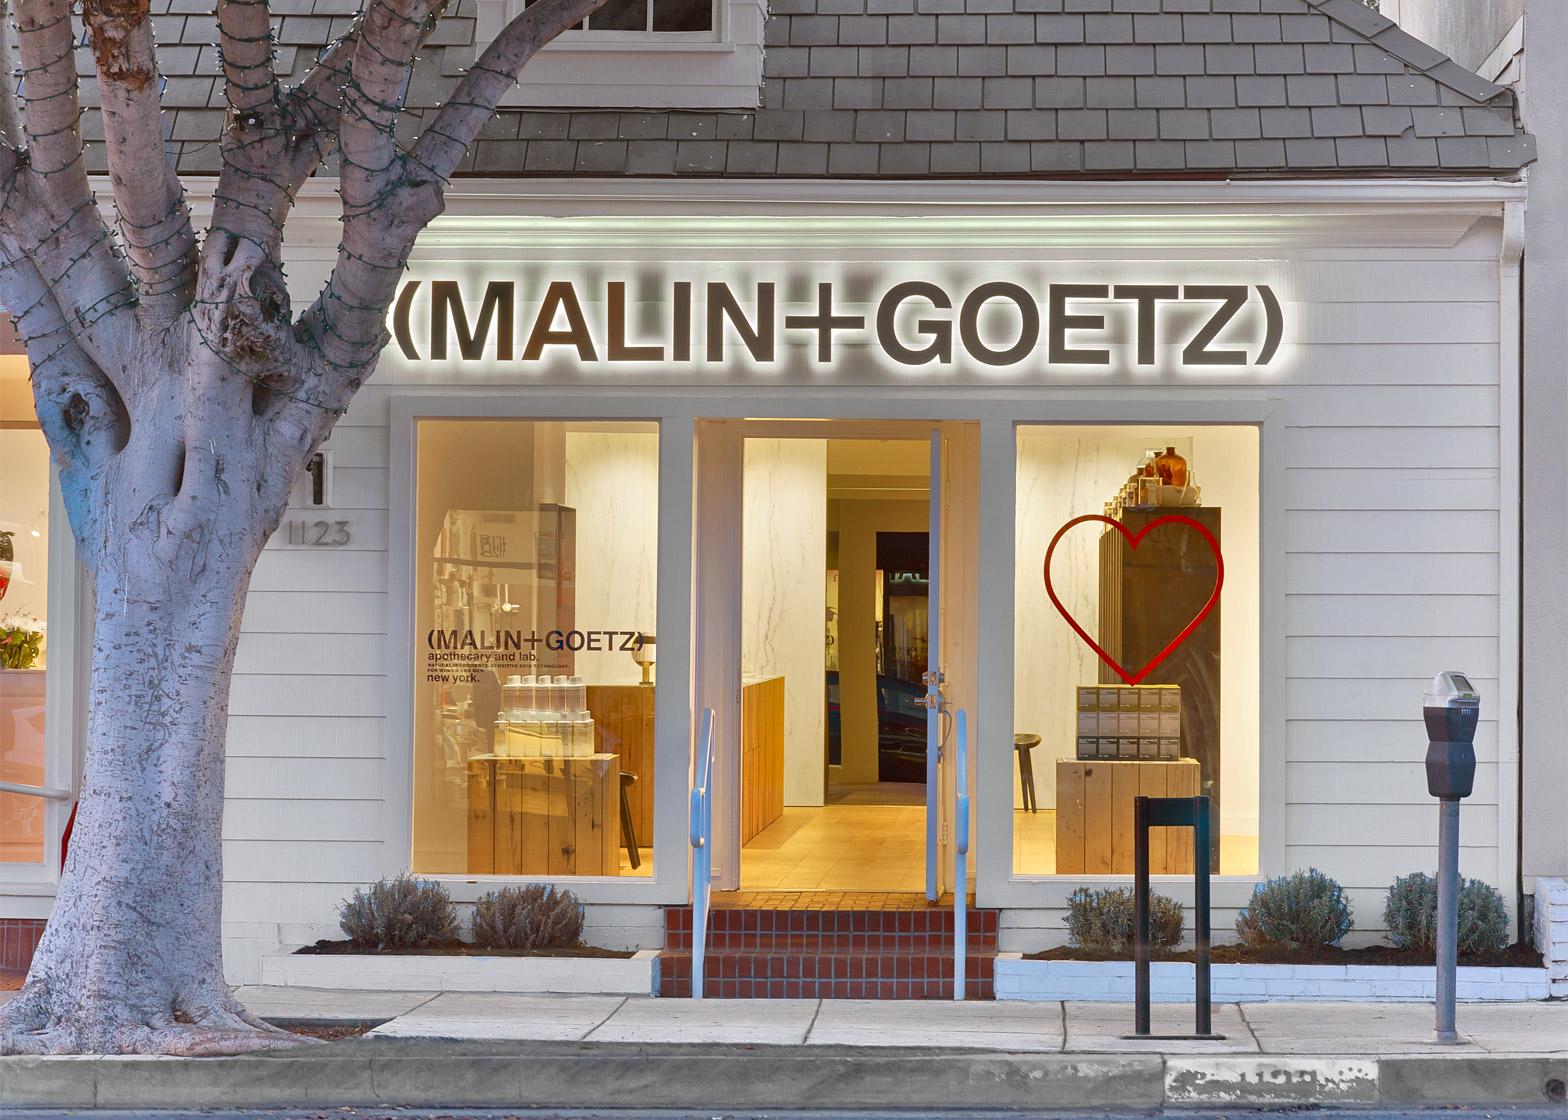 Malin+Goetz Santa Monica Store by Messana-O'rorke